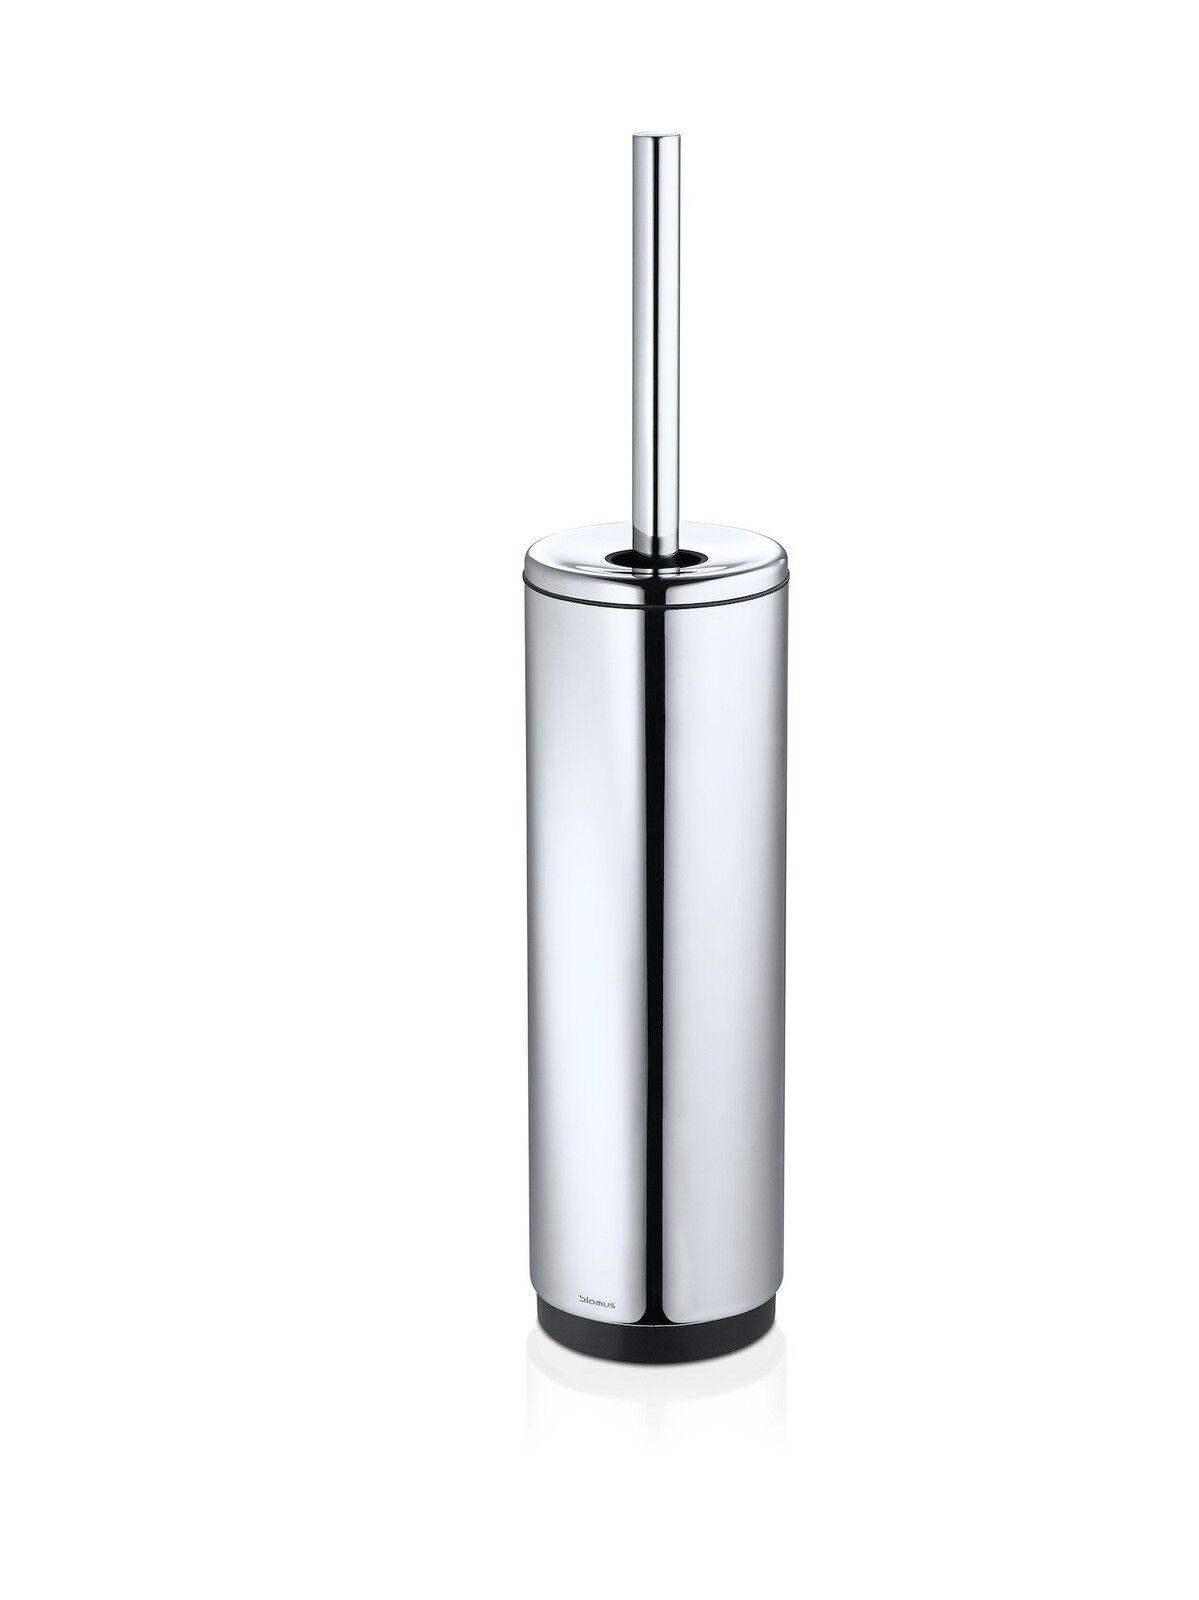 Blomus WC Bürste Uno Edelstahl poliert Nr. 68876 | Moderner Modus